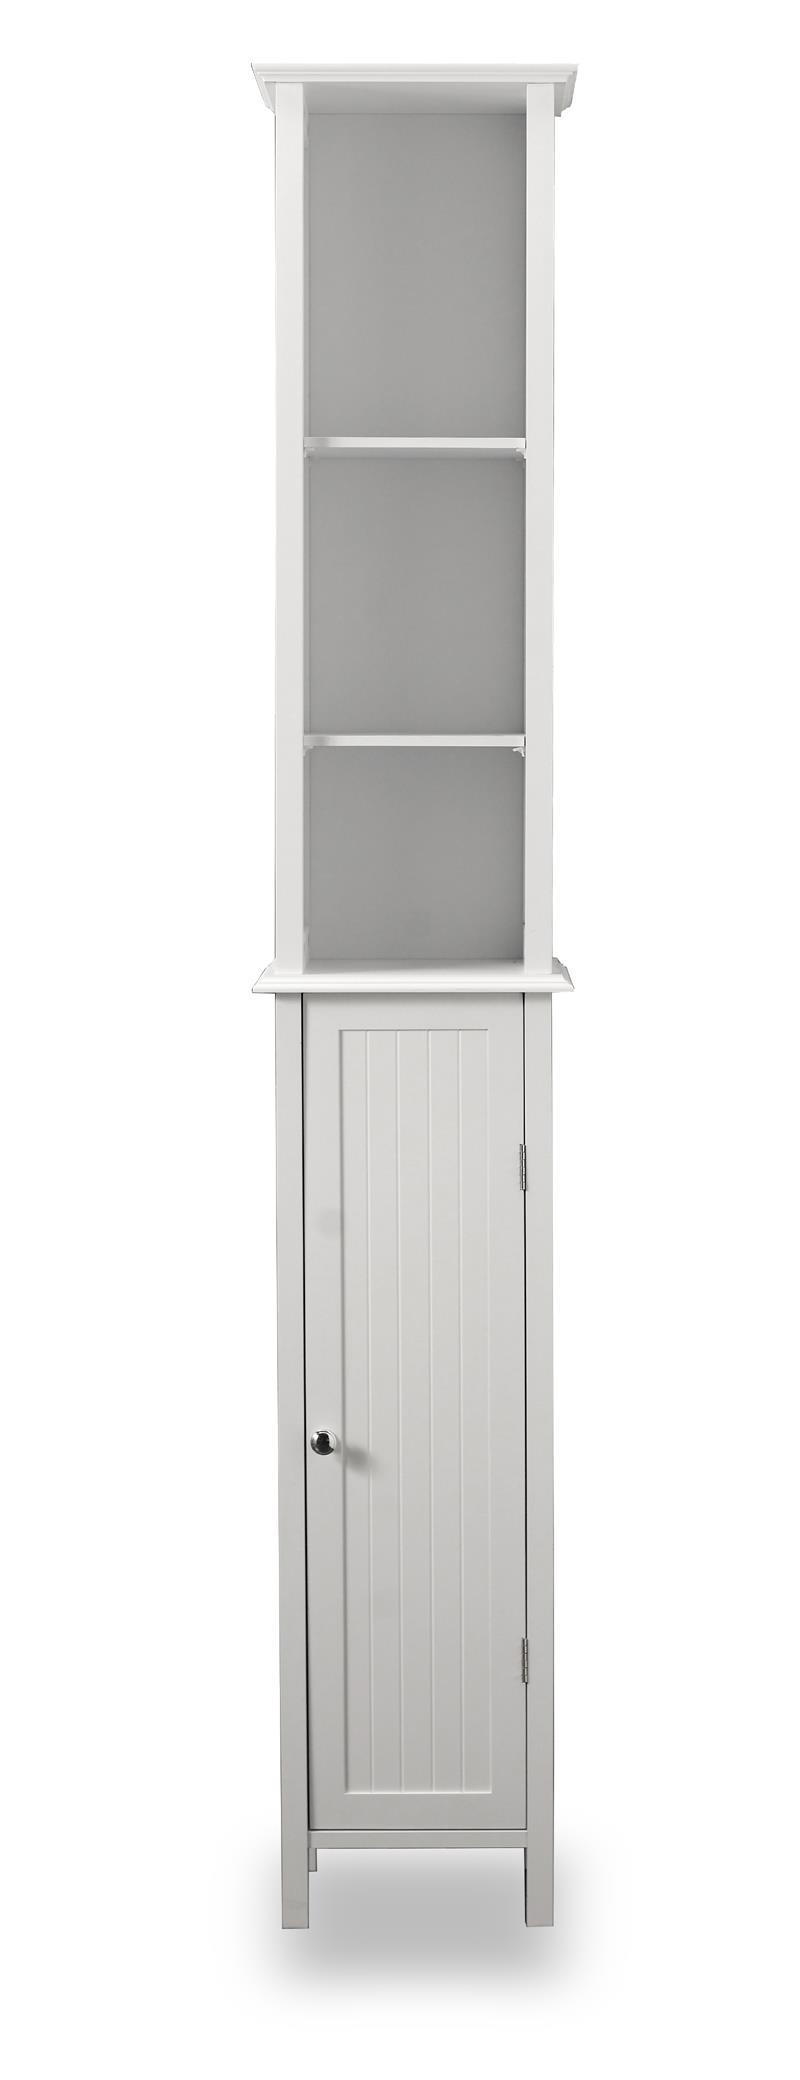 Bathrooms Freestanding Tall C Cabinets Bathroom Wall Narrow regarding size 800 X 2080